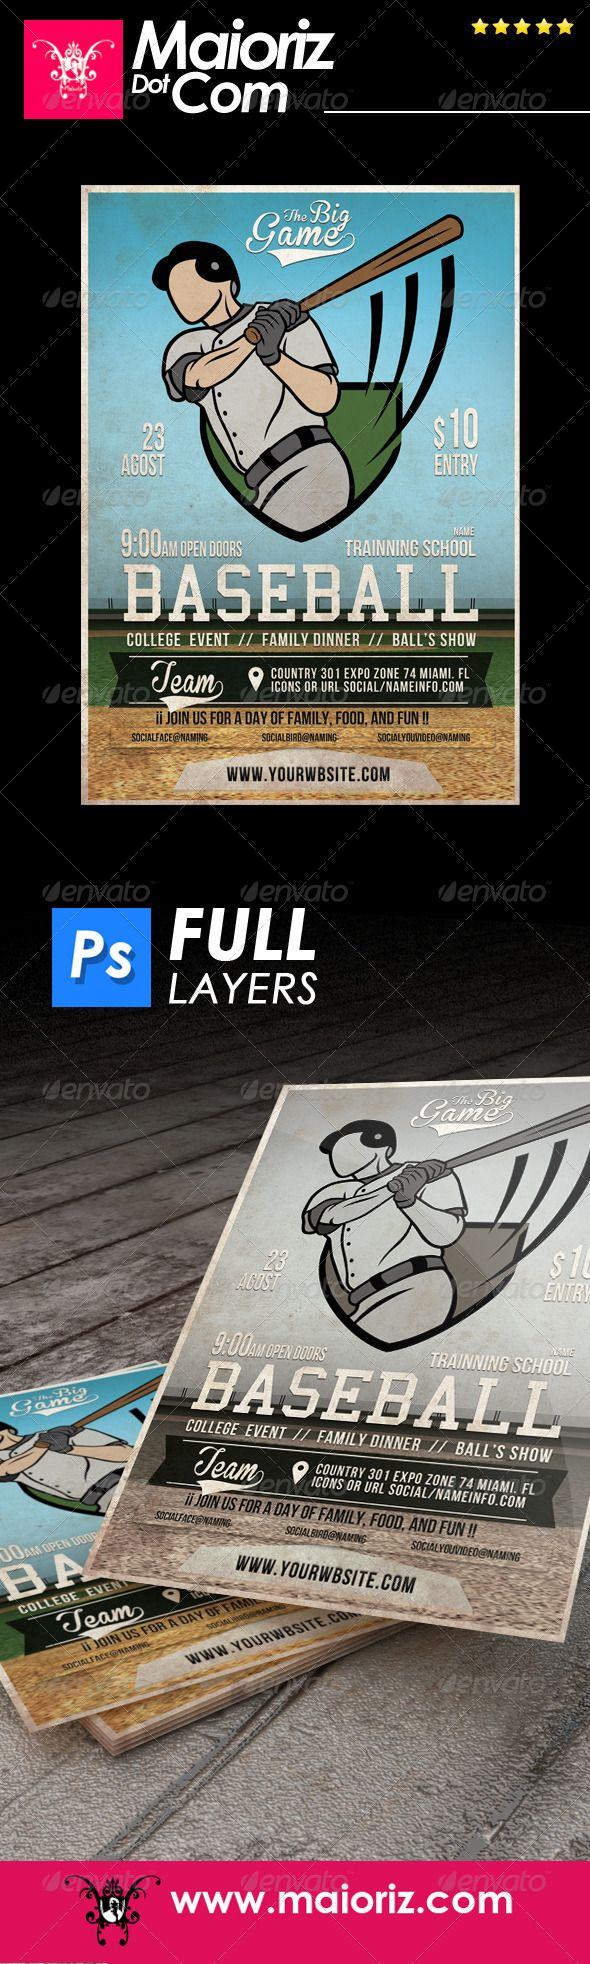 Indie Baseball Flyer By Maioriz Blackboard Style Best Design